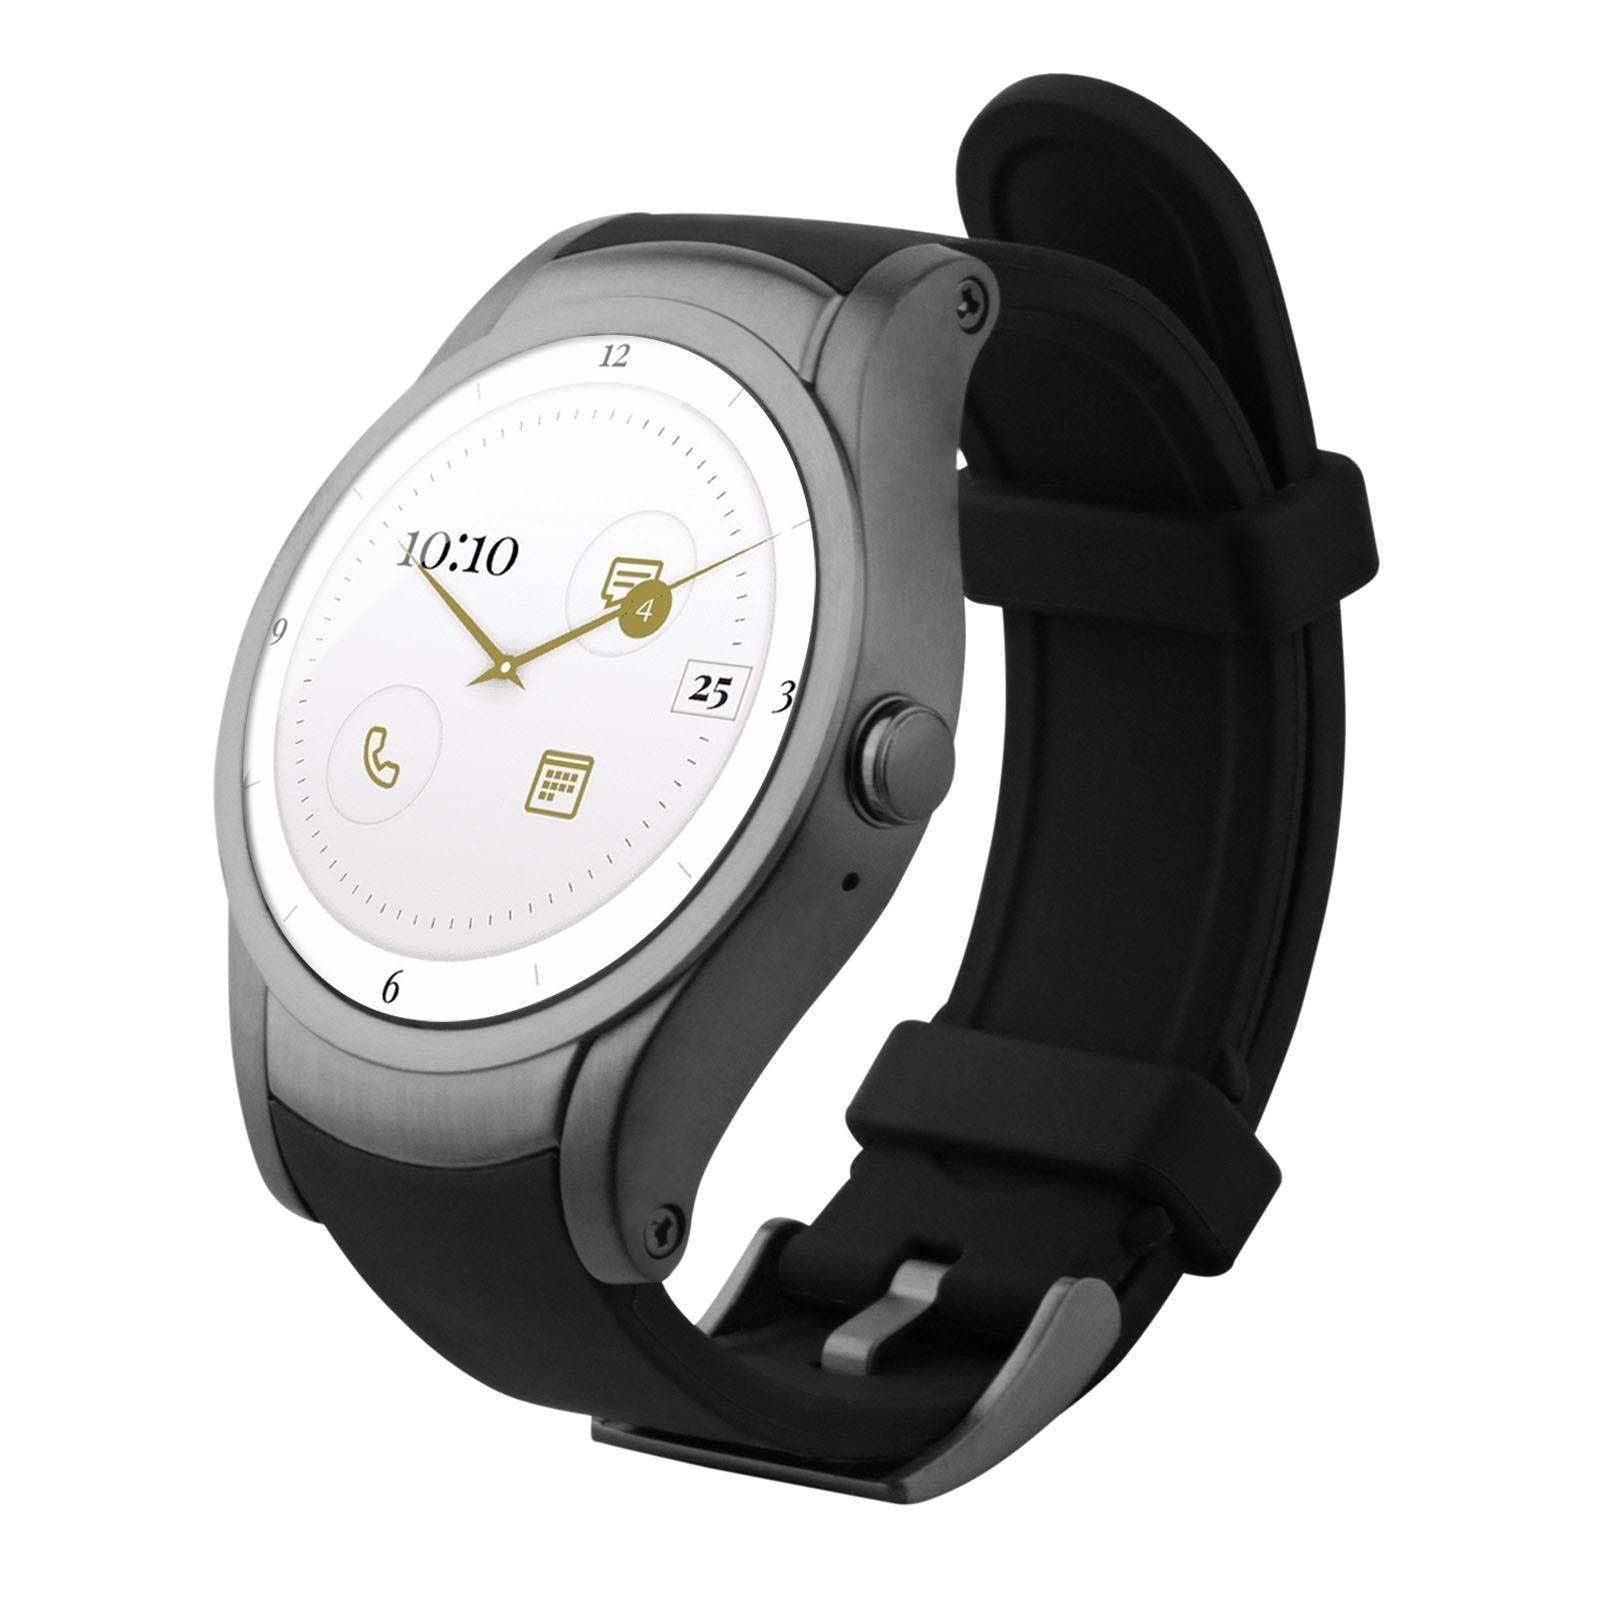 Wear24 Quanta Smartwatch by Verizon 42mm WiFi + Bluetooth Android Wear 2.0